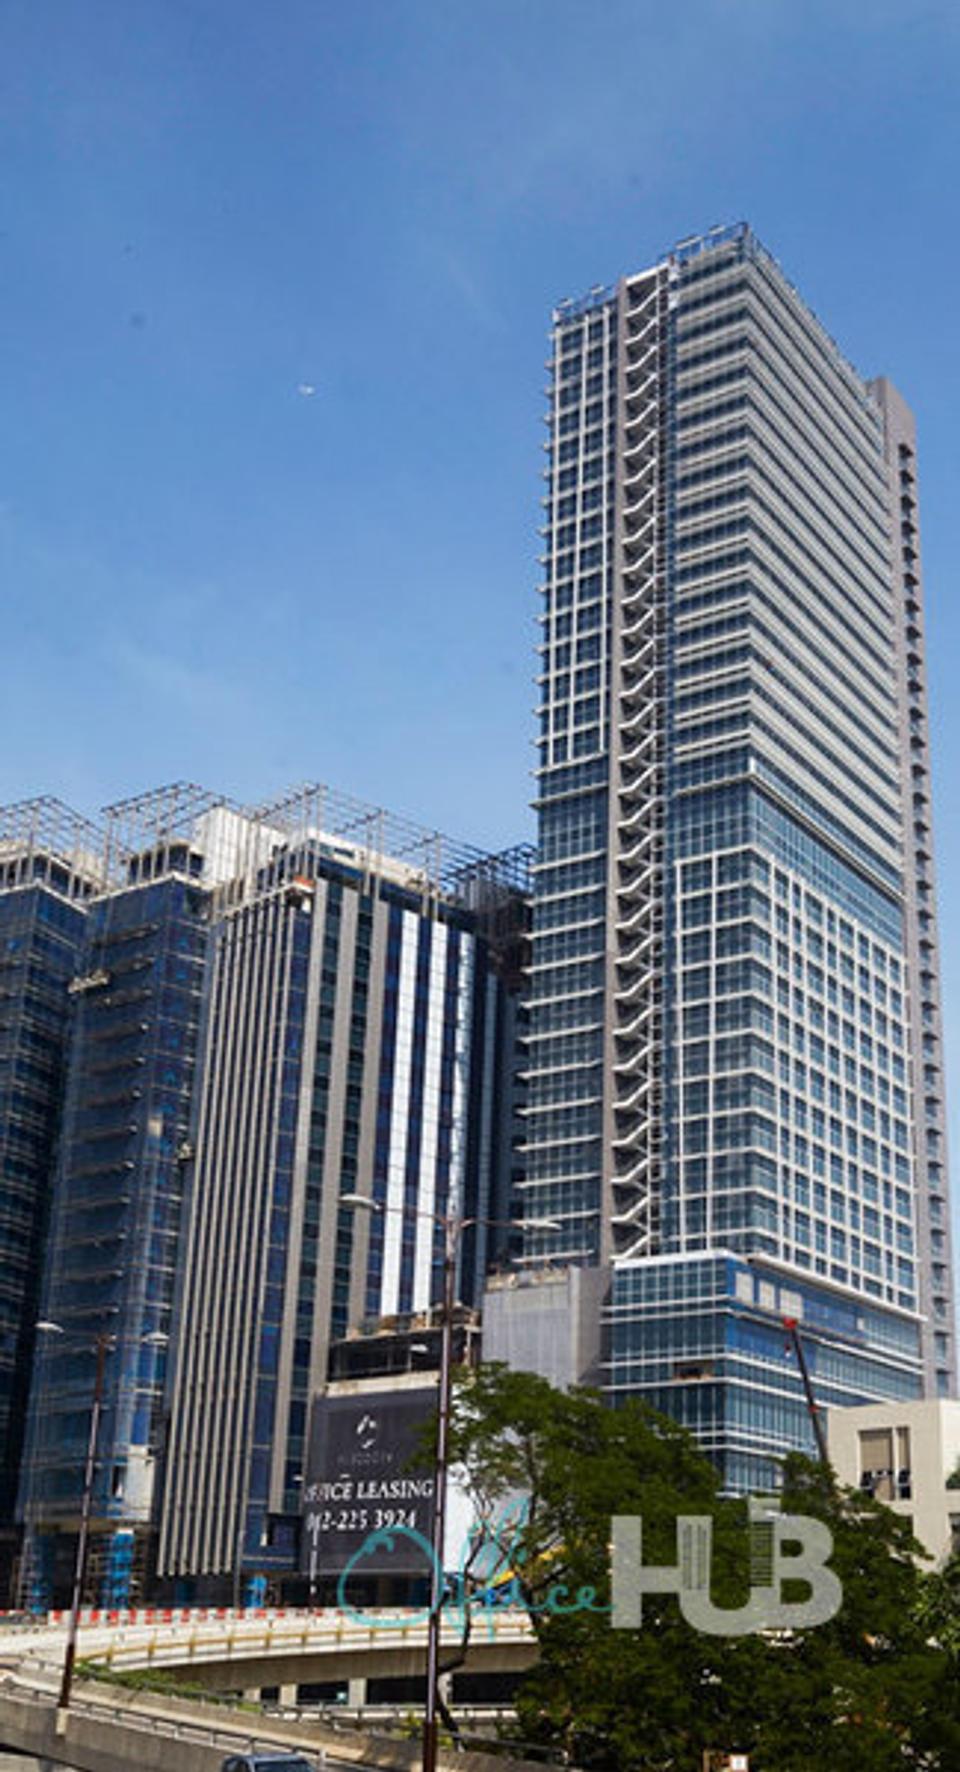 20 Person Private Office For Lease At No. 3 Jalan Bangsar, Kuala Lumpur, Malaysia, 59200 - image 1